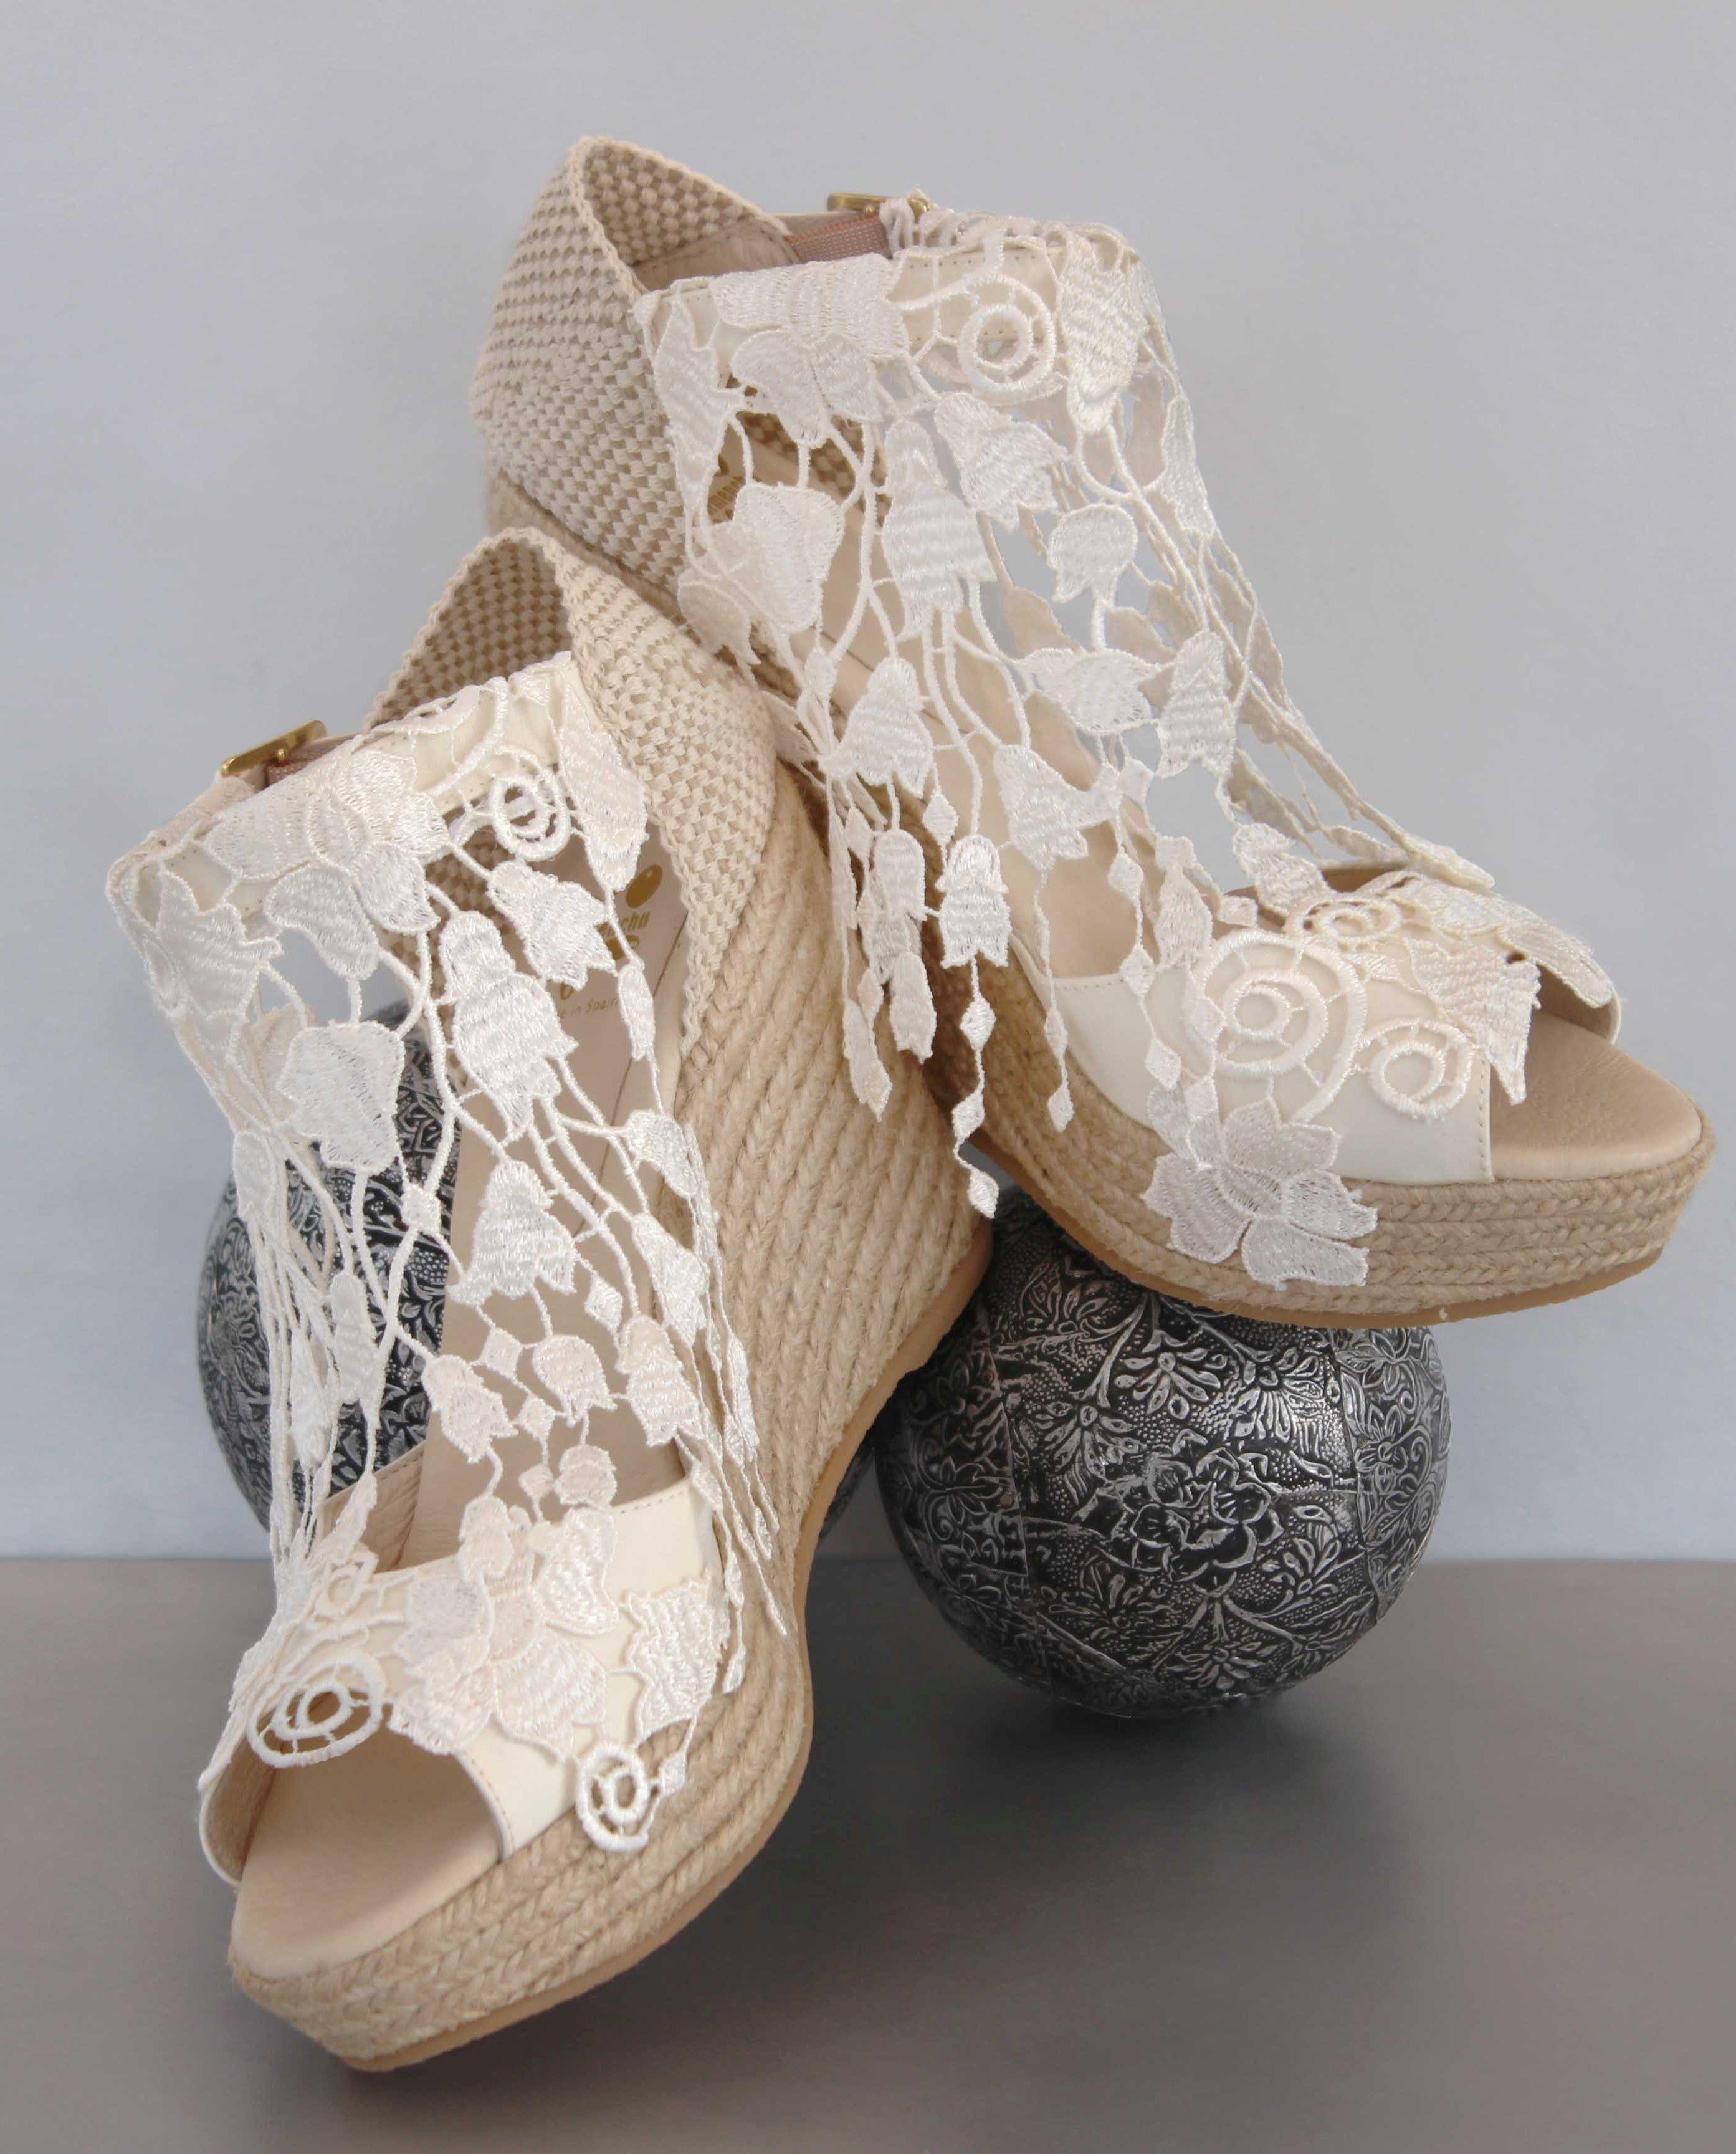 bf91a1bfa6 Carmenchu Shoes colección novias 2016. www.carmenchu.es. #bridalwedges # cuñas…